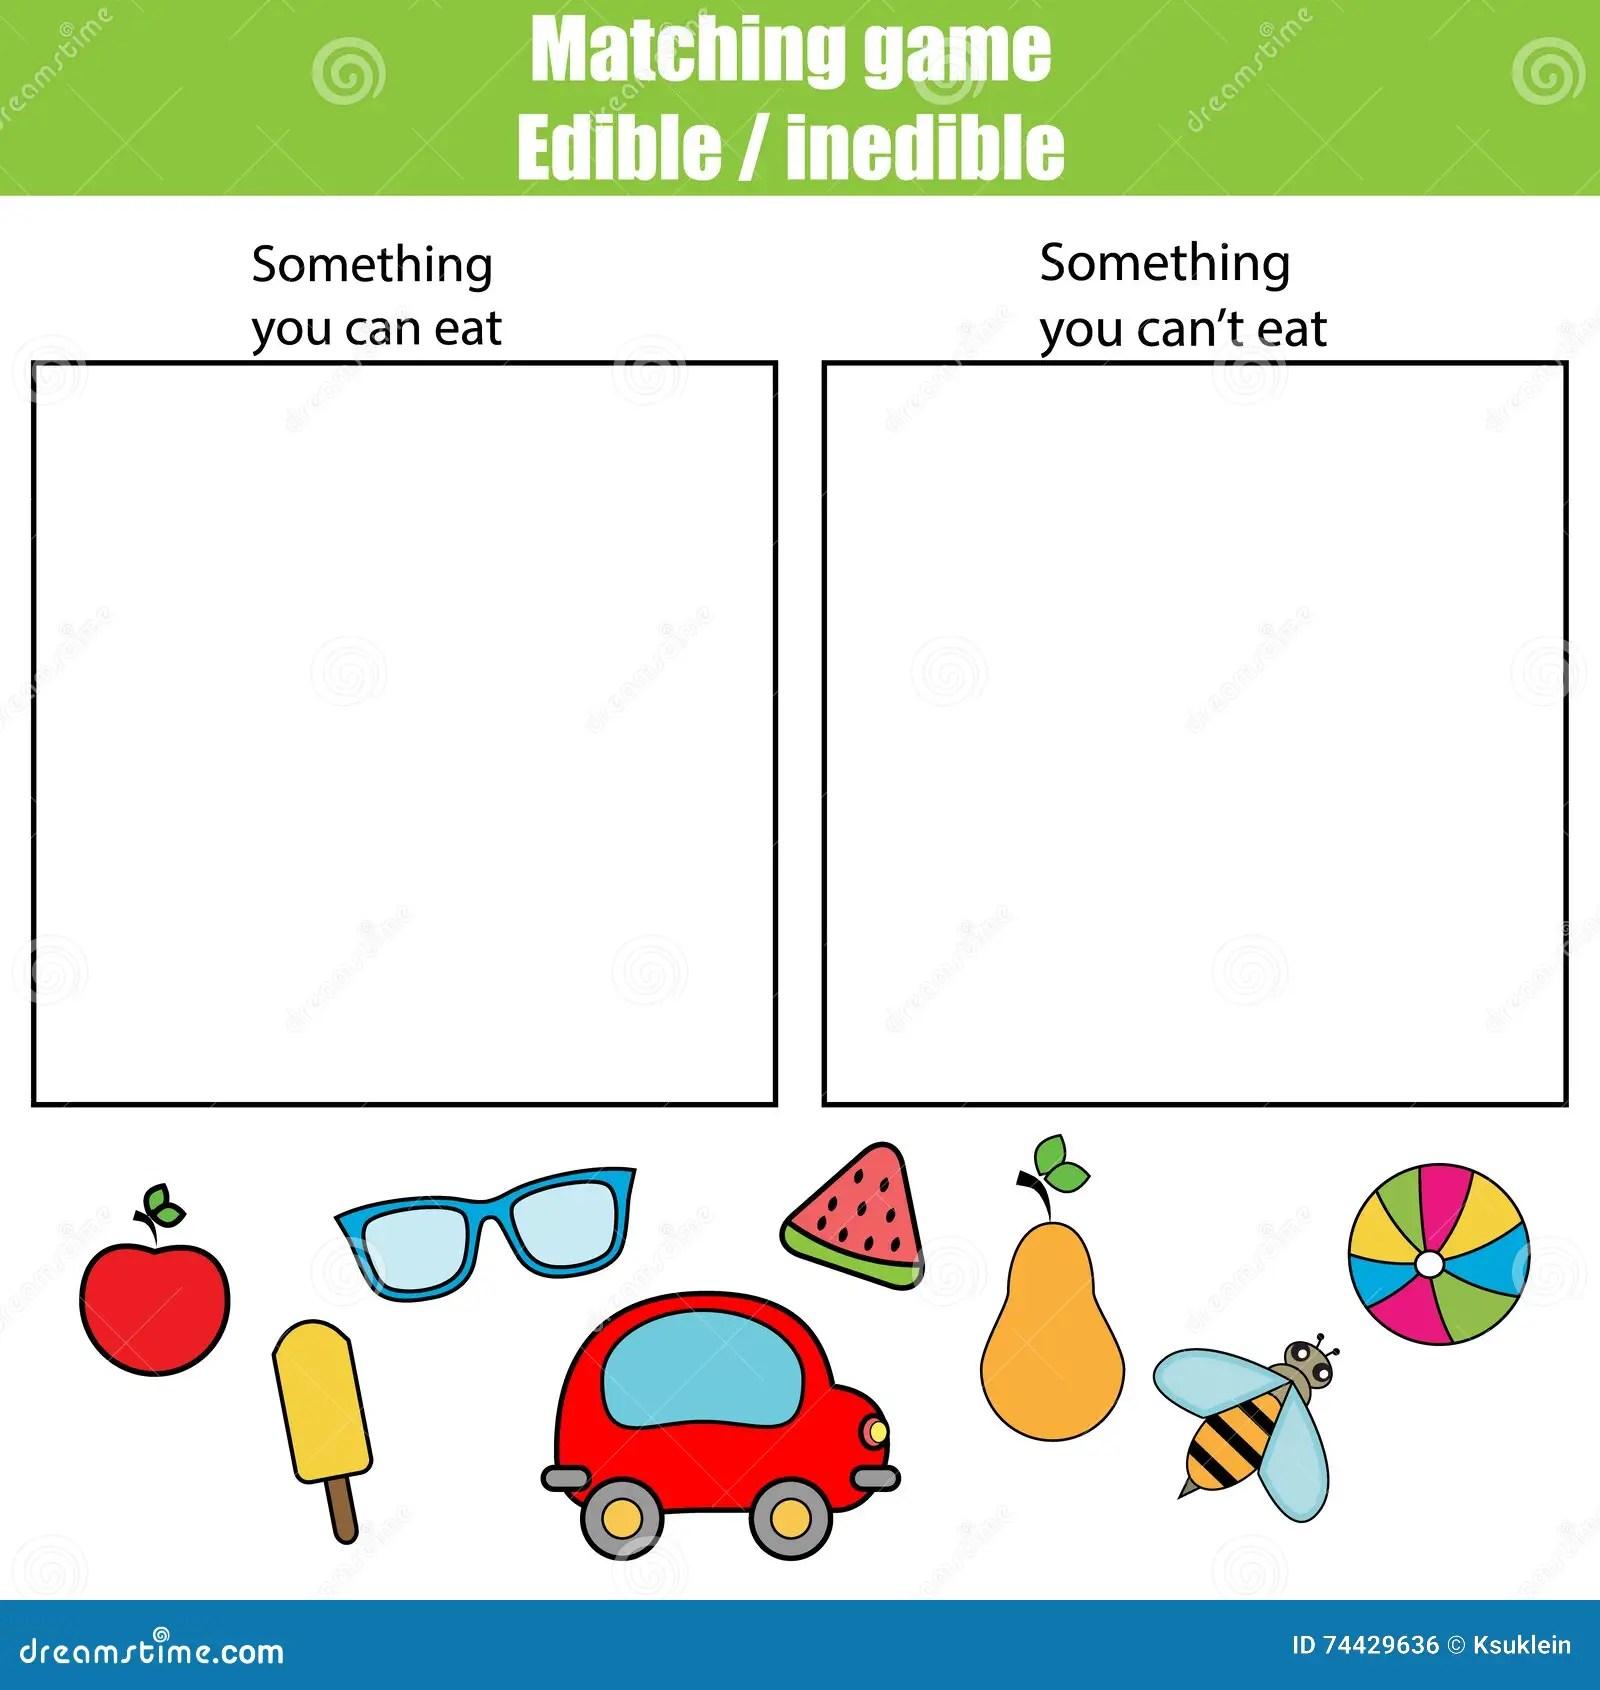 Edible Inedible Educational Children Game Kids Activity